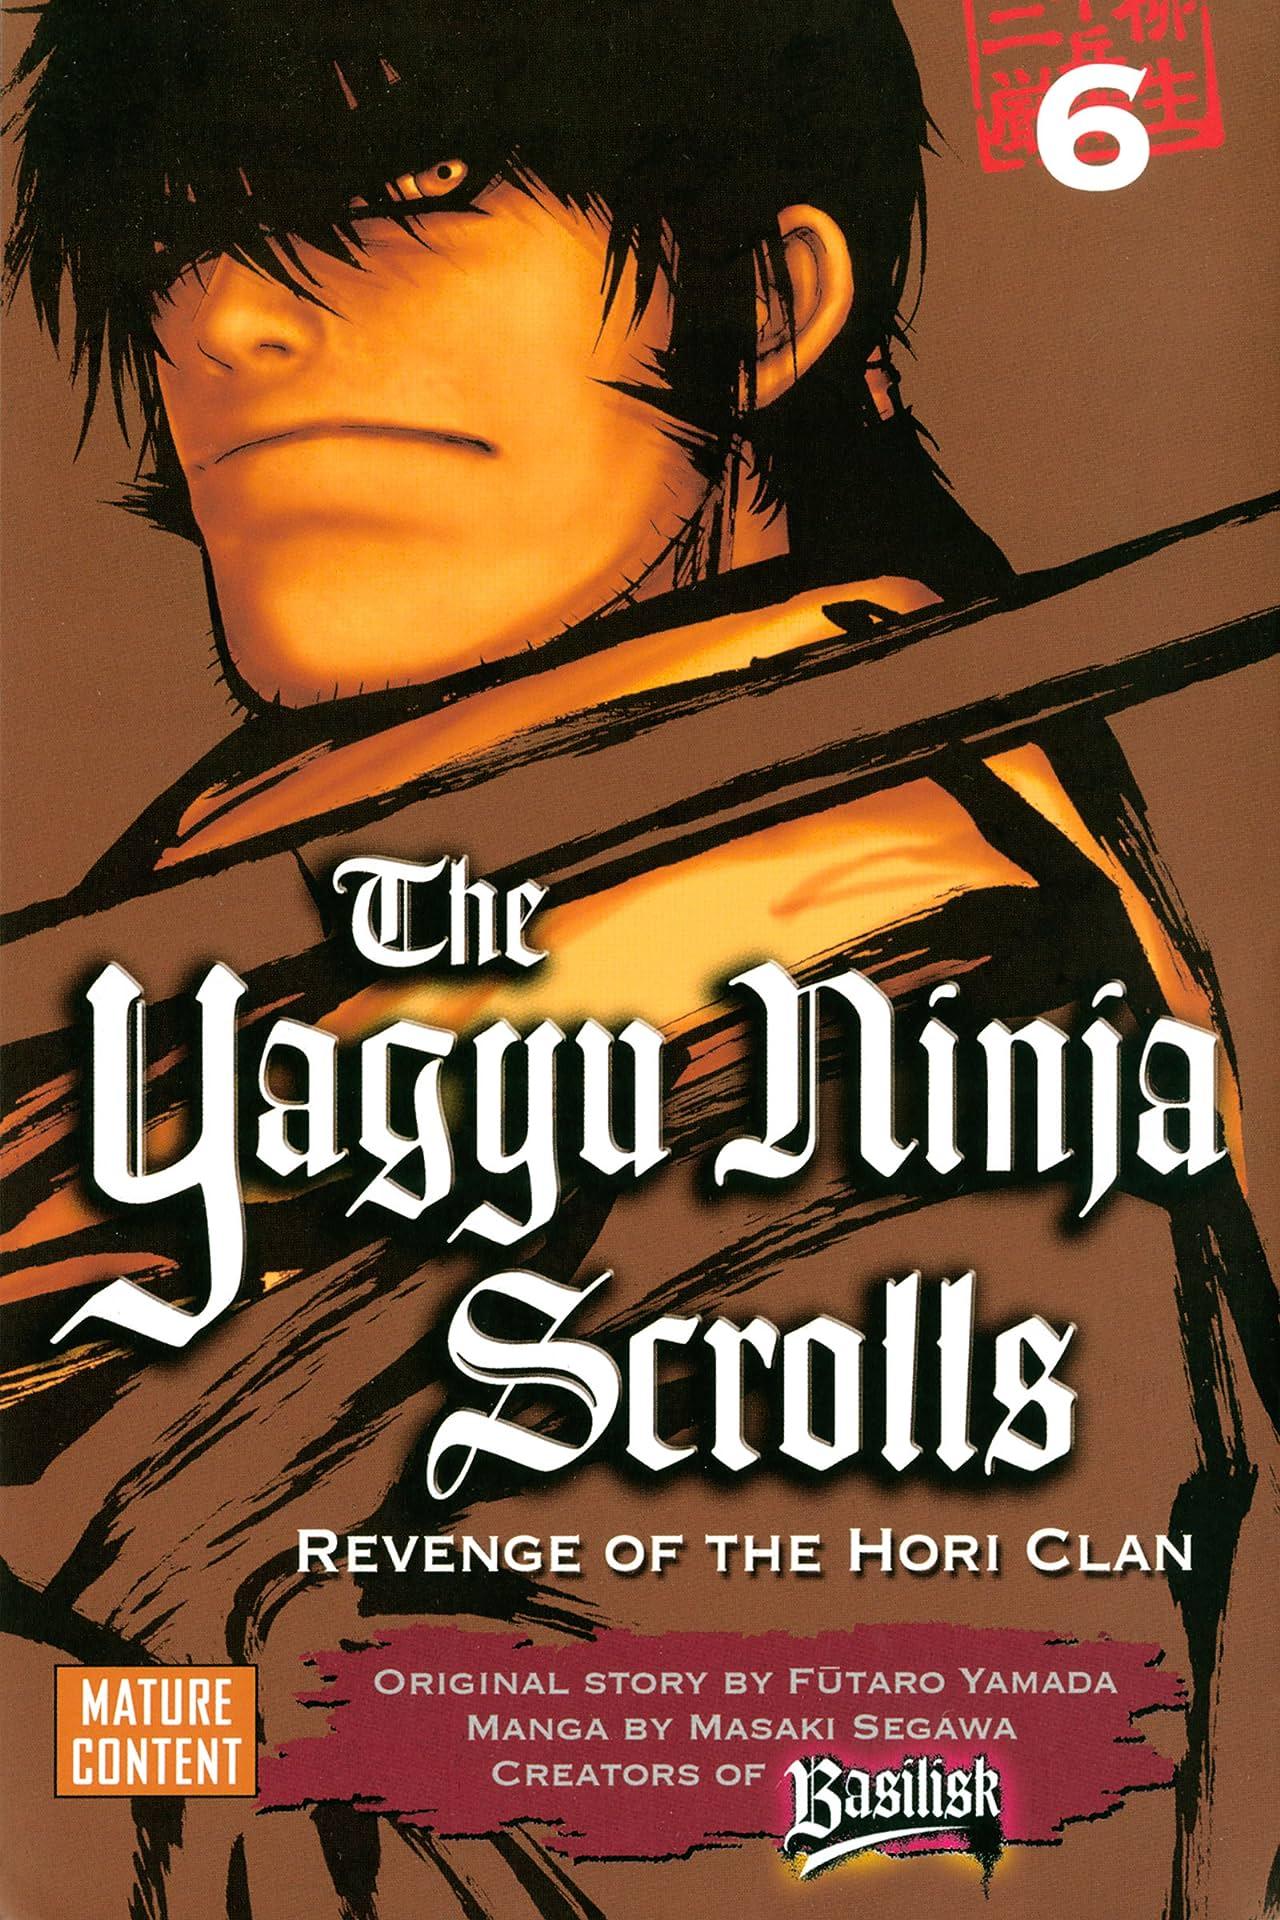 Yagyu Ninja Scrolls Vol. 6